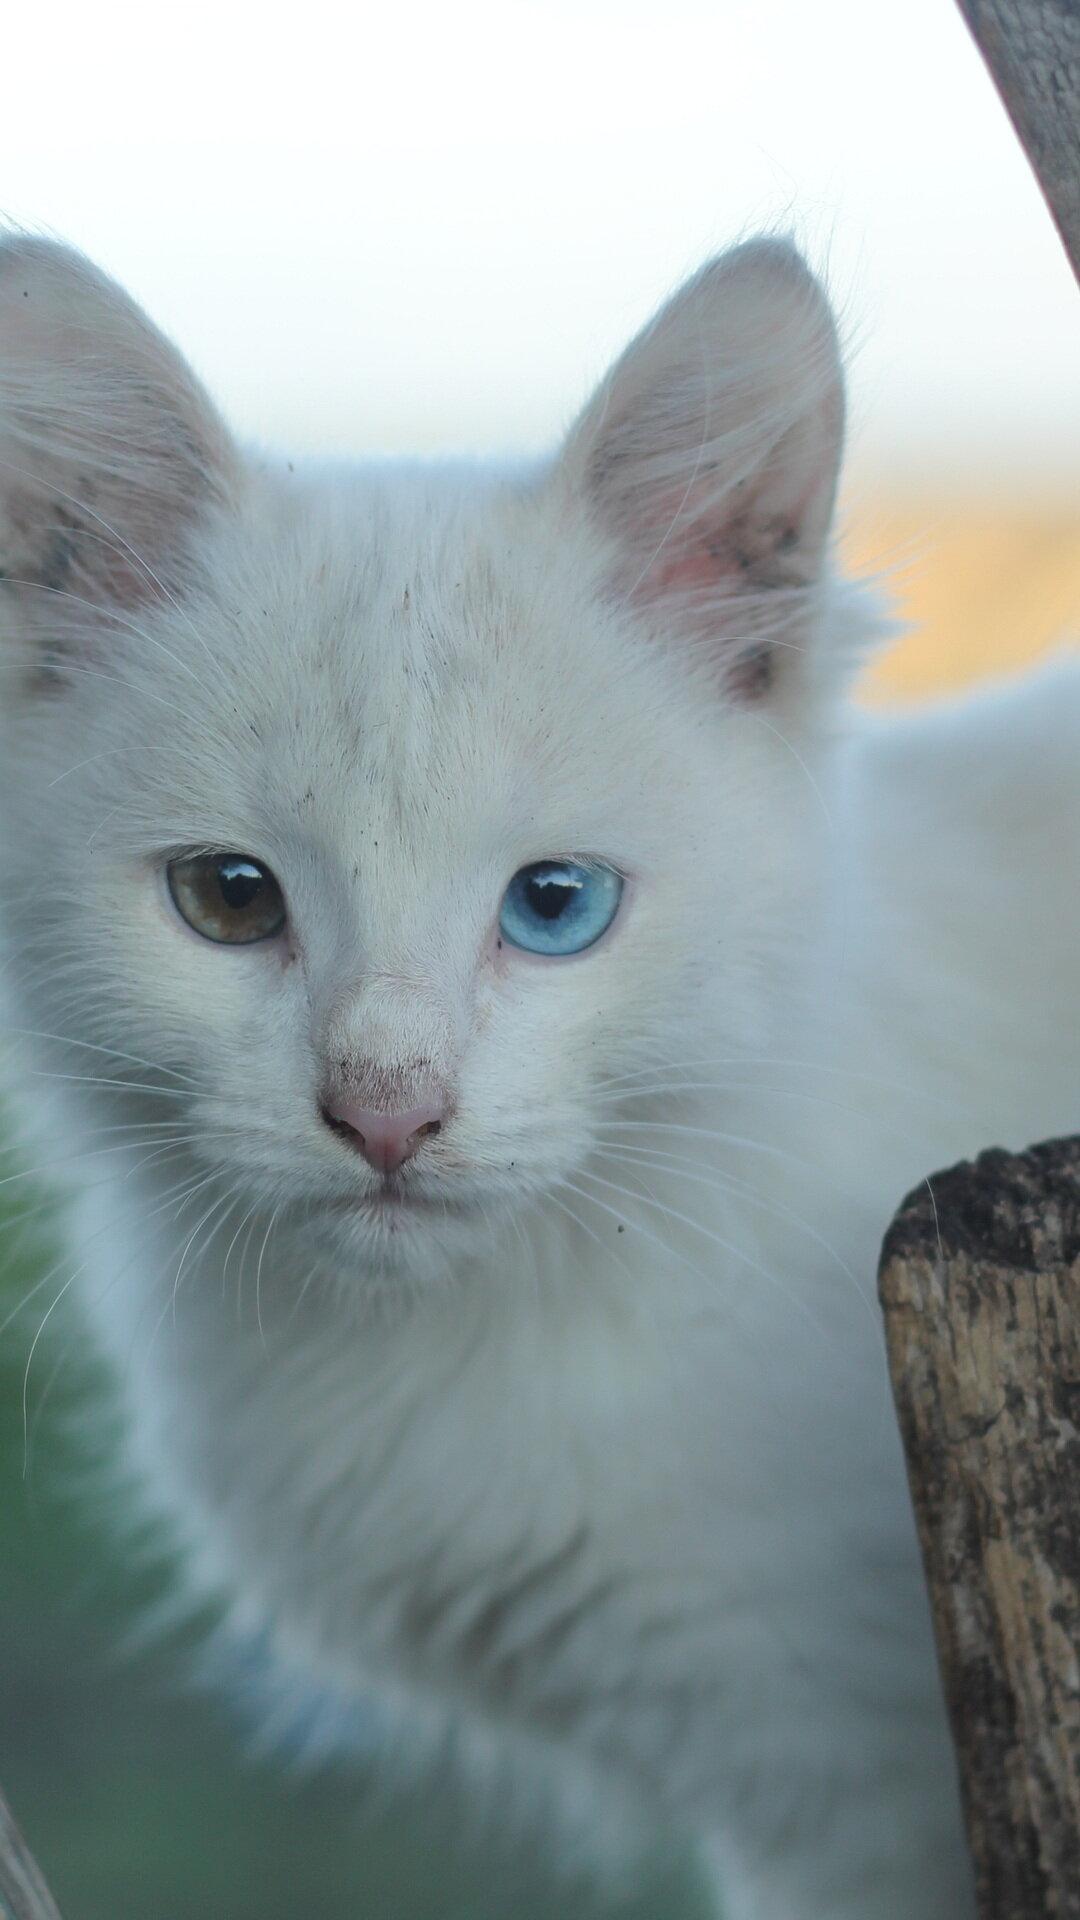 жил доме, белые котята с разными глазами картинки музее фарфора